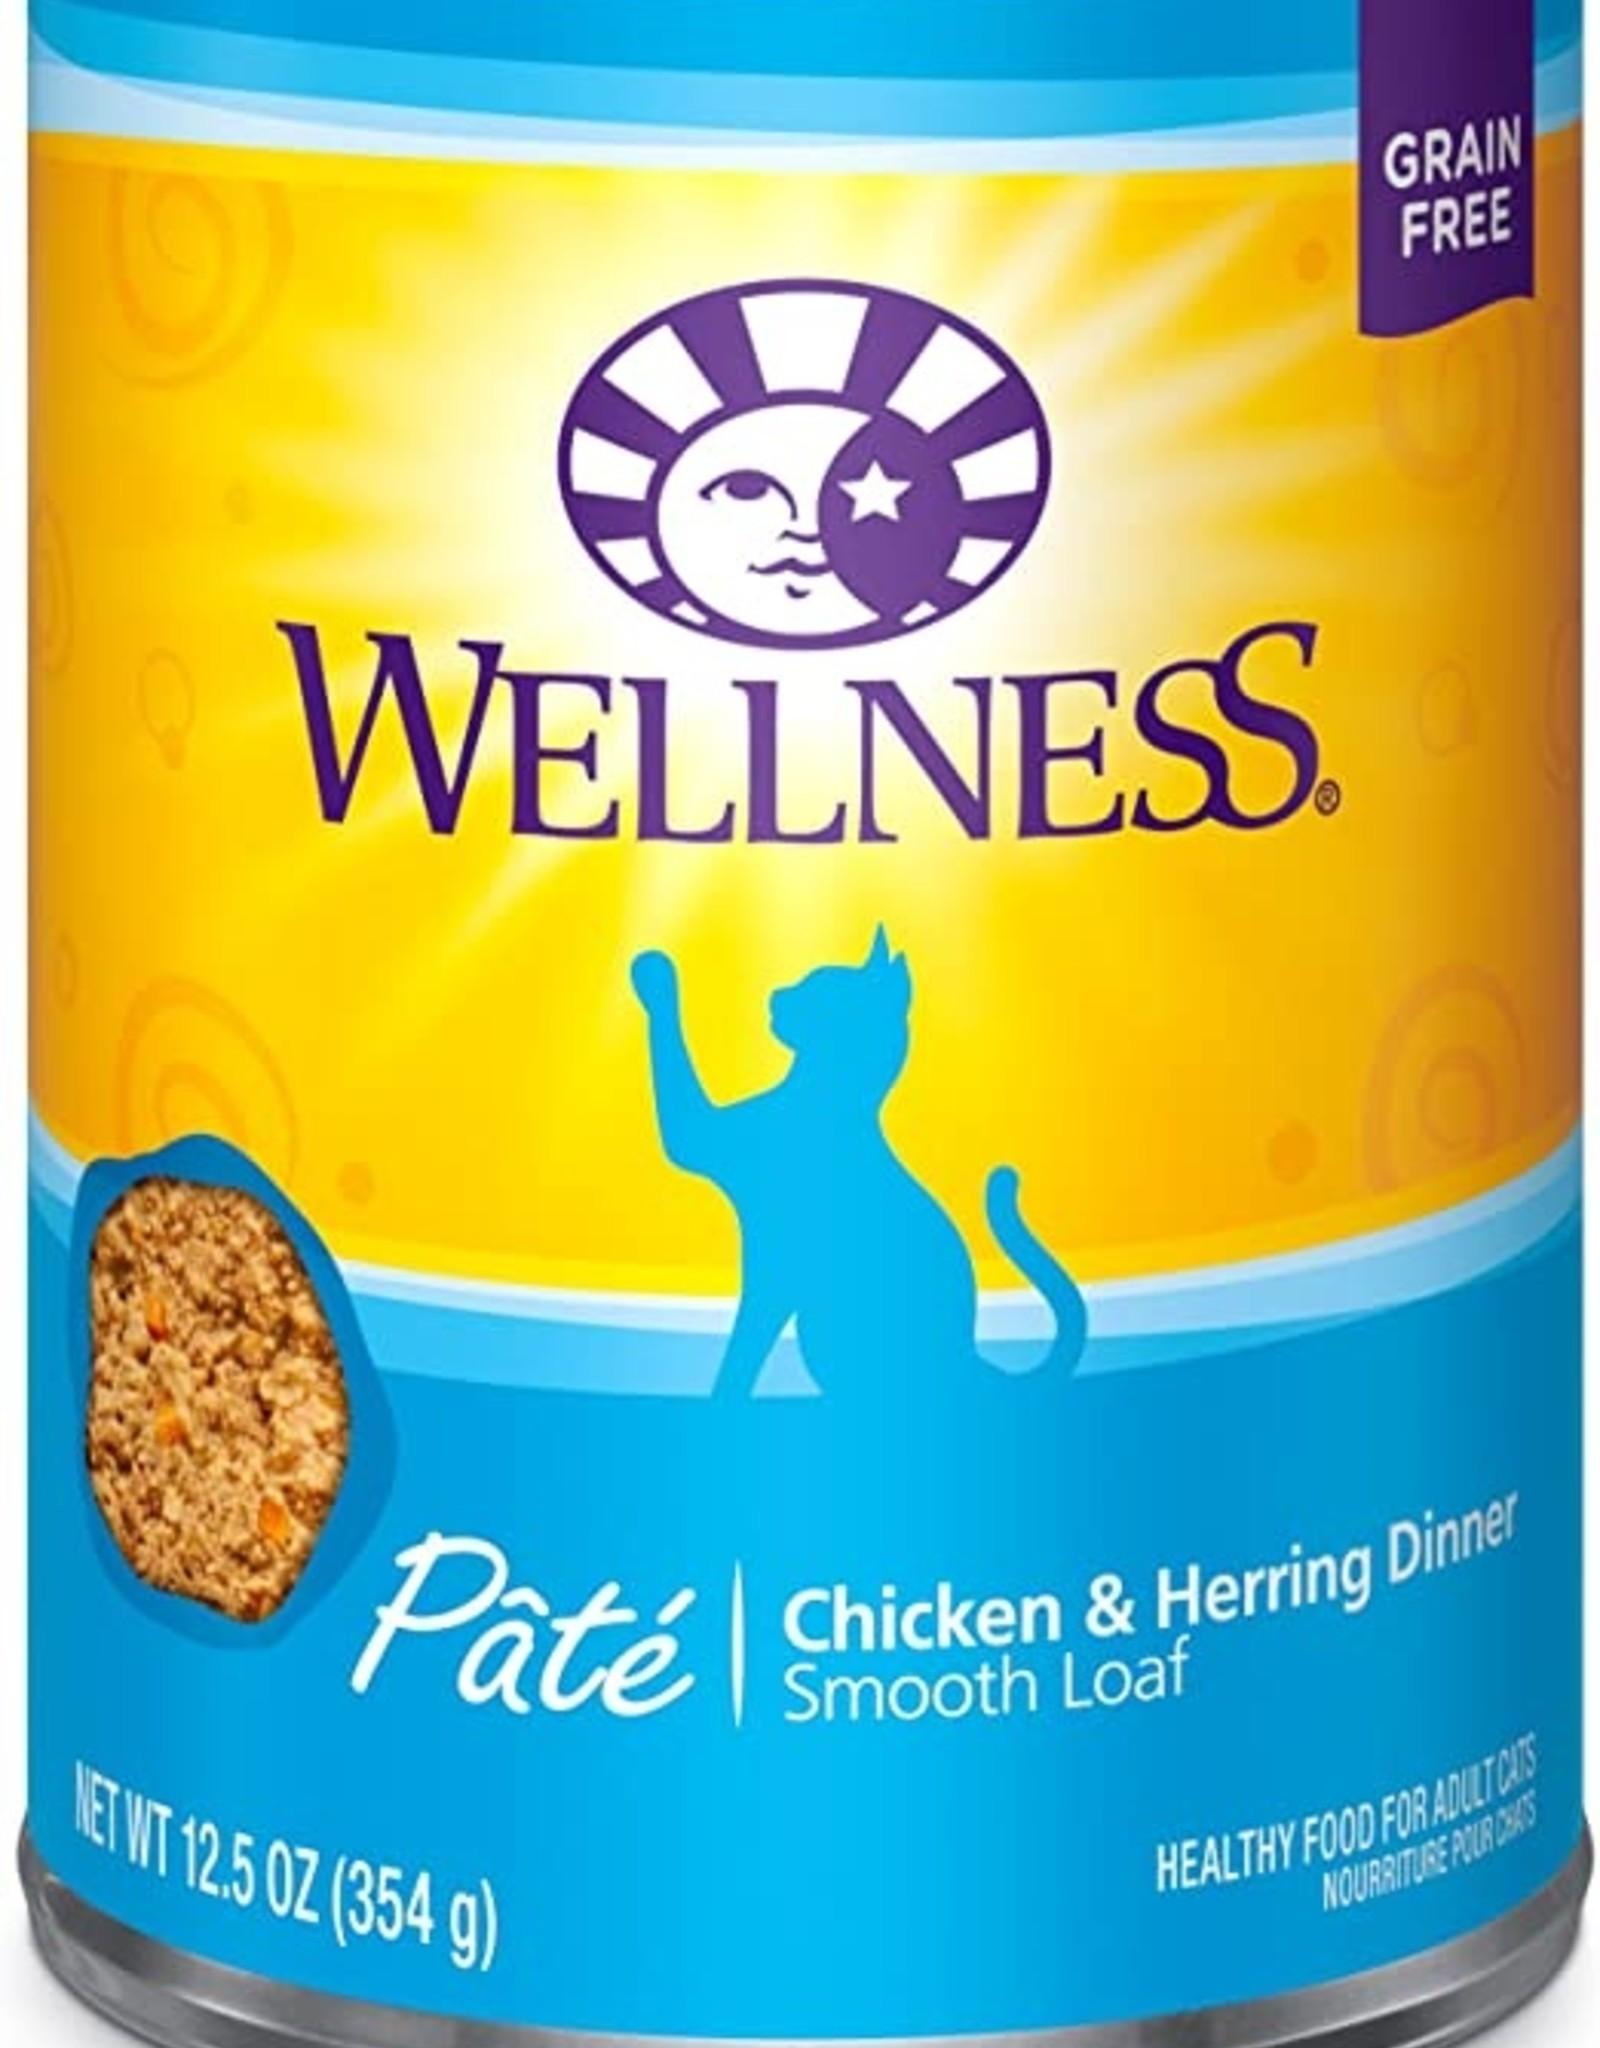 Wellness Pet Food Cat Complete Chicken & Herring Pate - Grain-Free 12oz